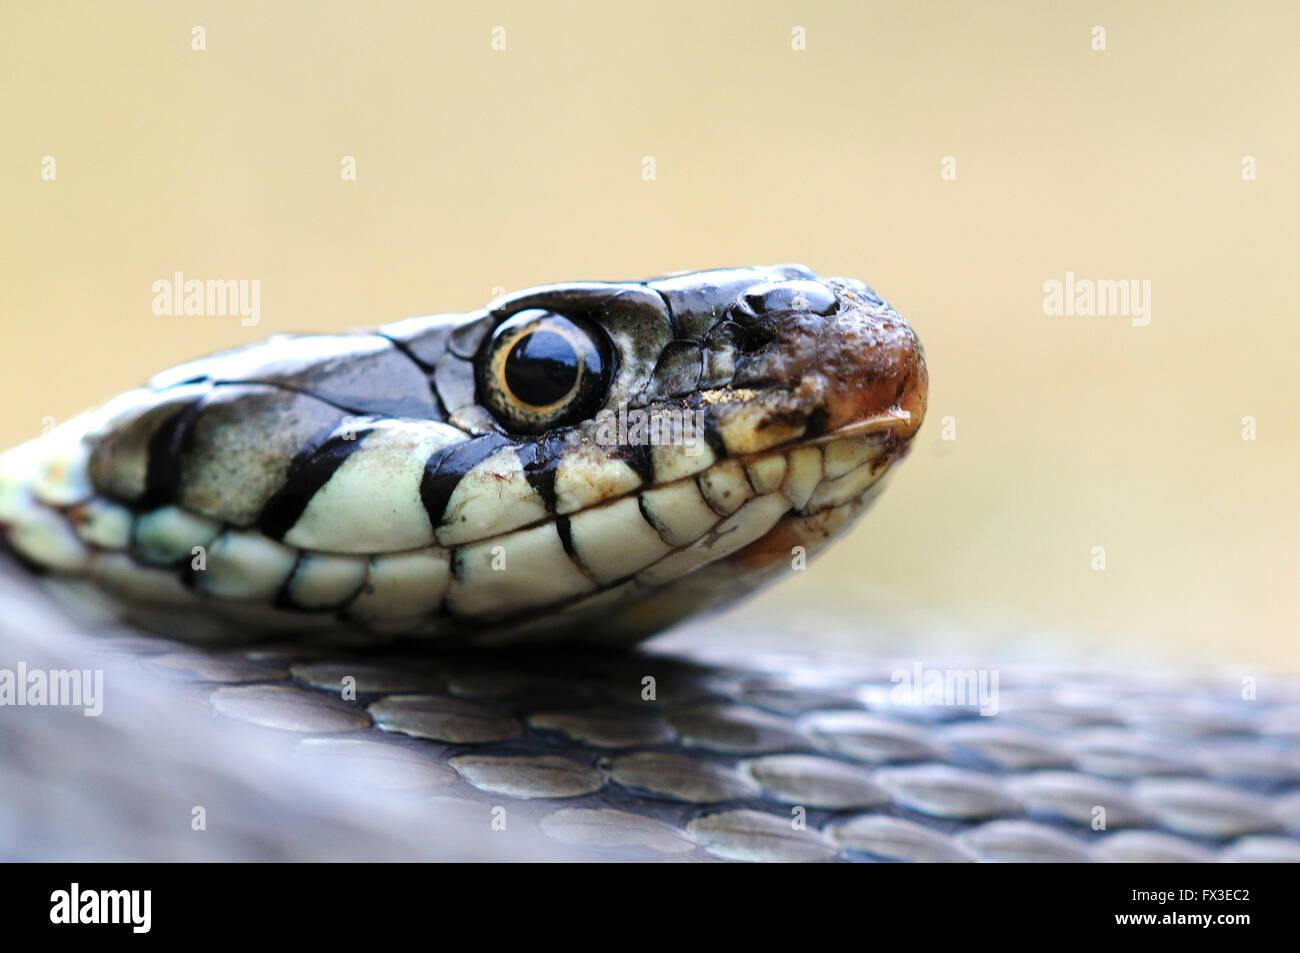 Coiled and alert grass snake. Dorset, UK July 2010 - Stock Image